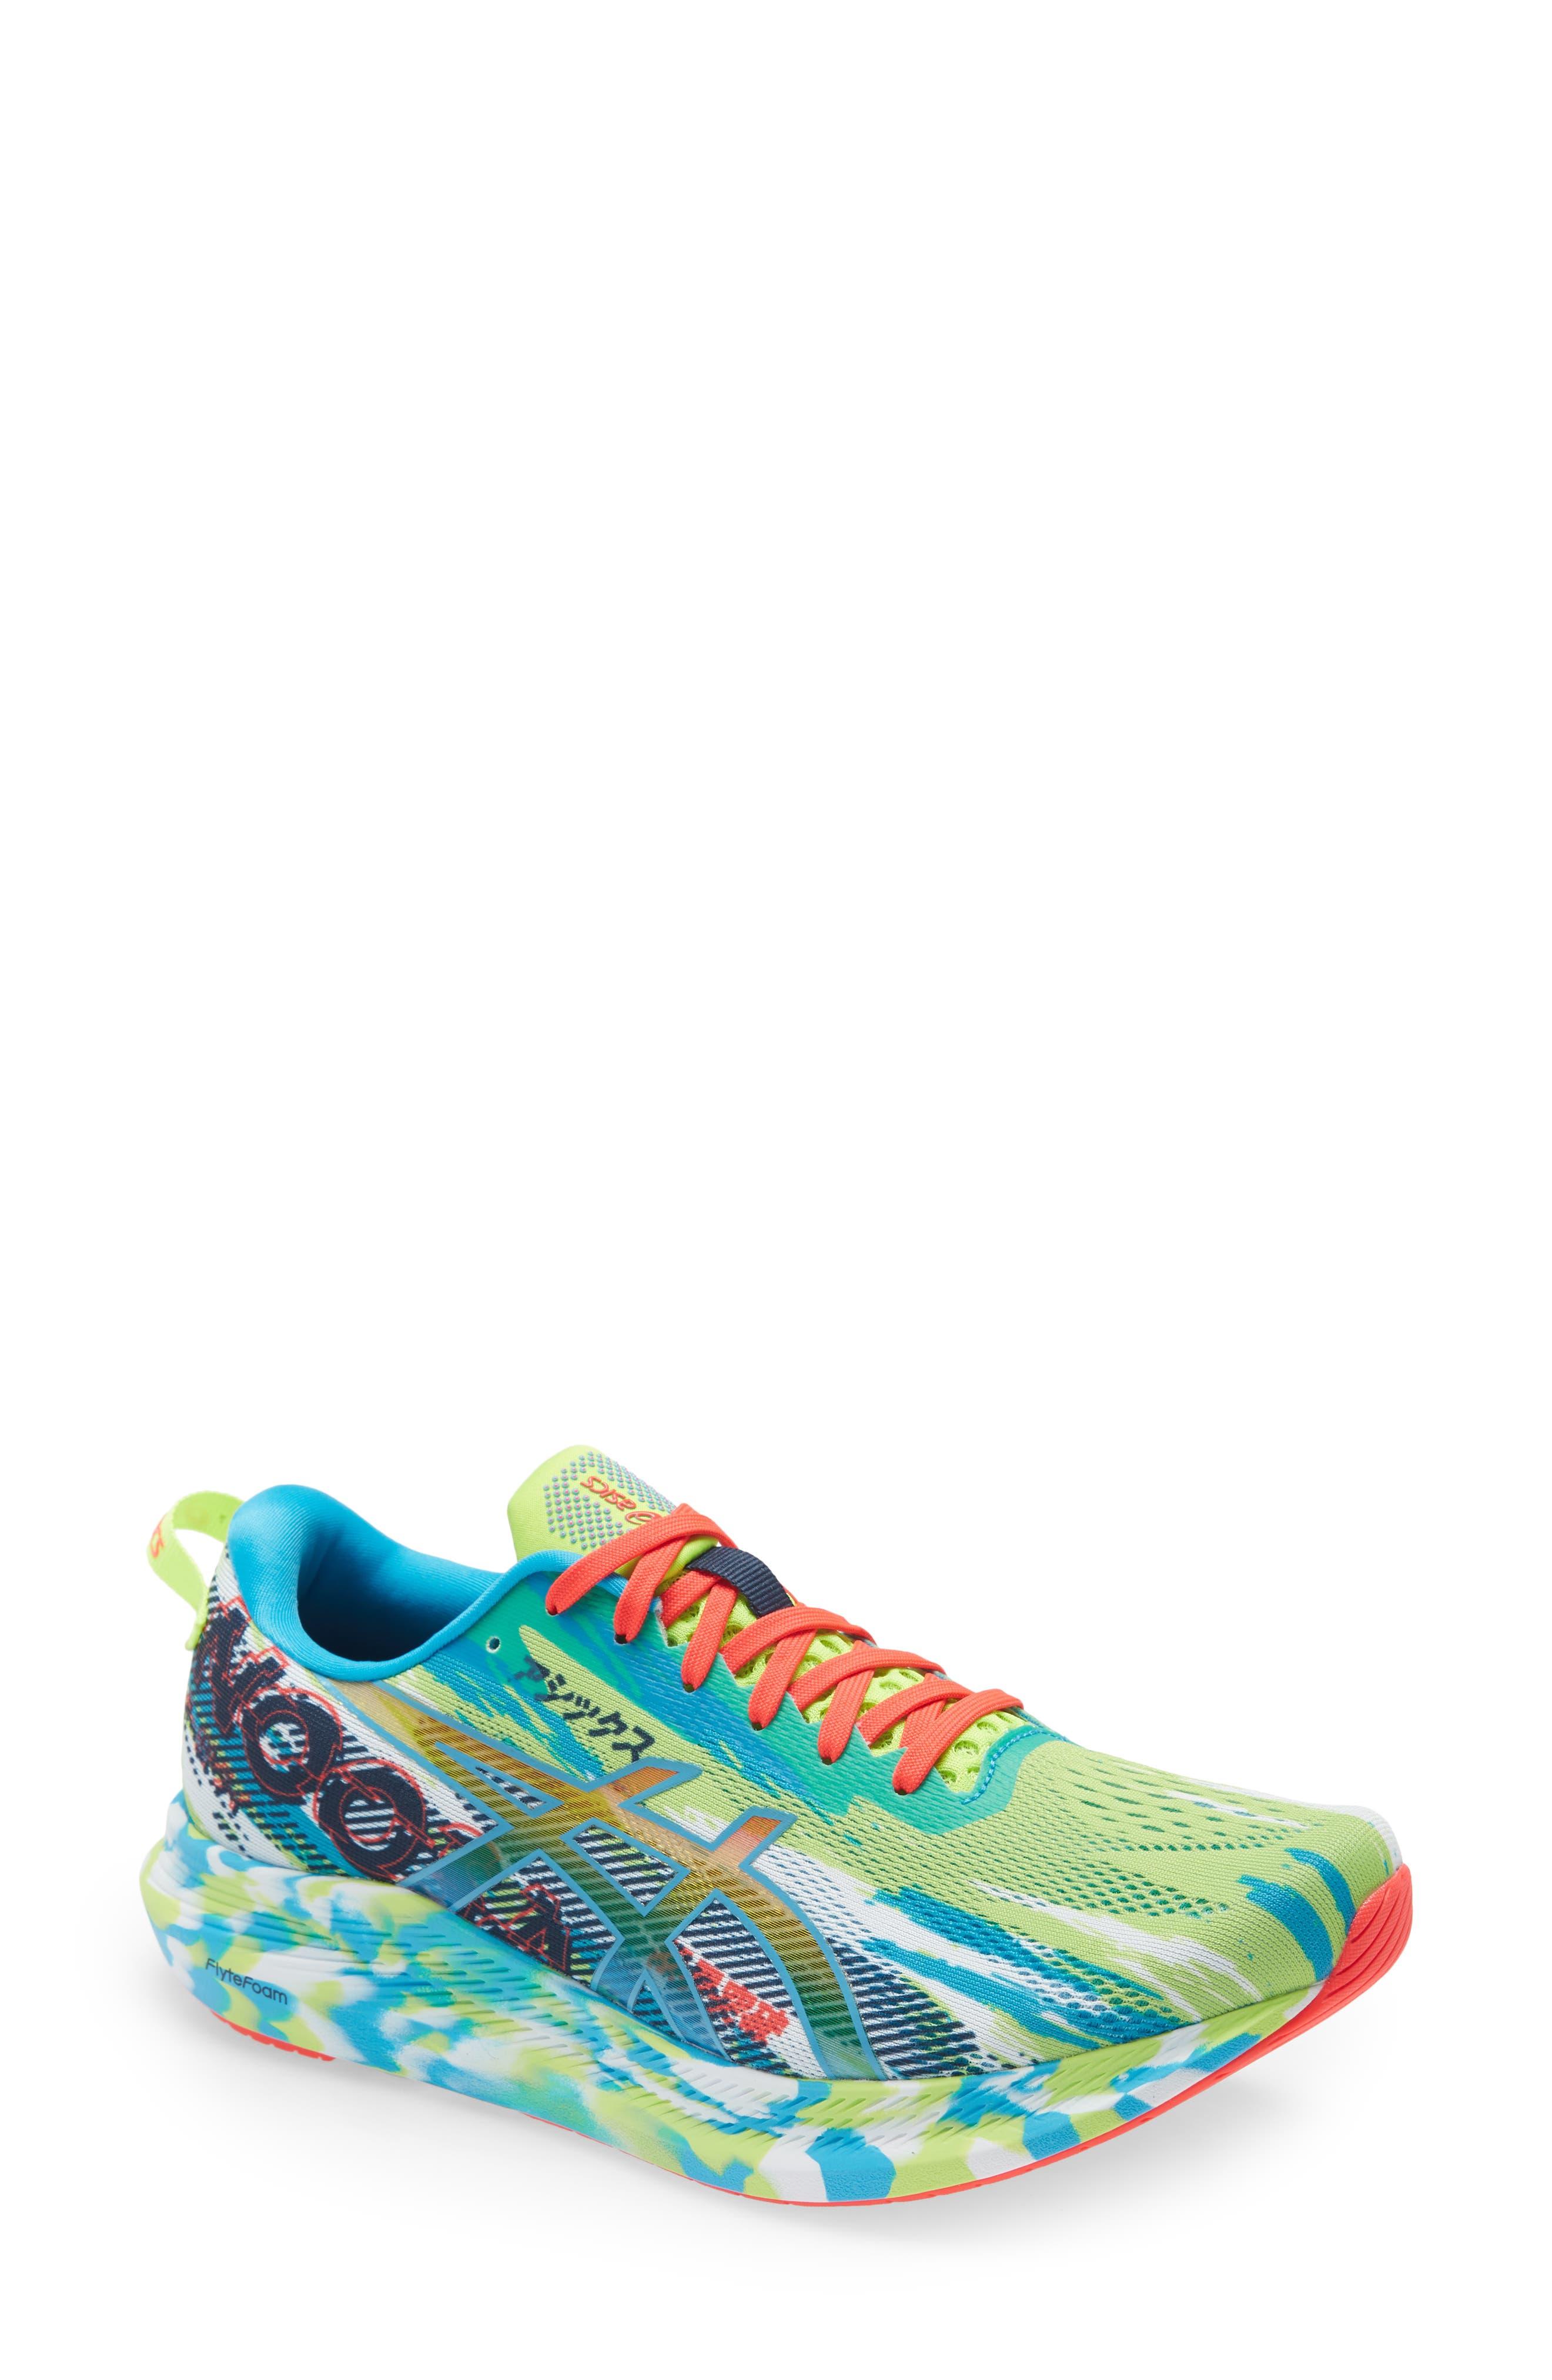 Men's Asics Noosa Tri(TM) 13 Running Shoe